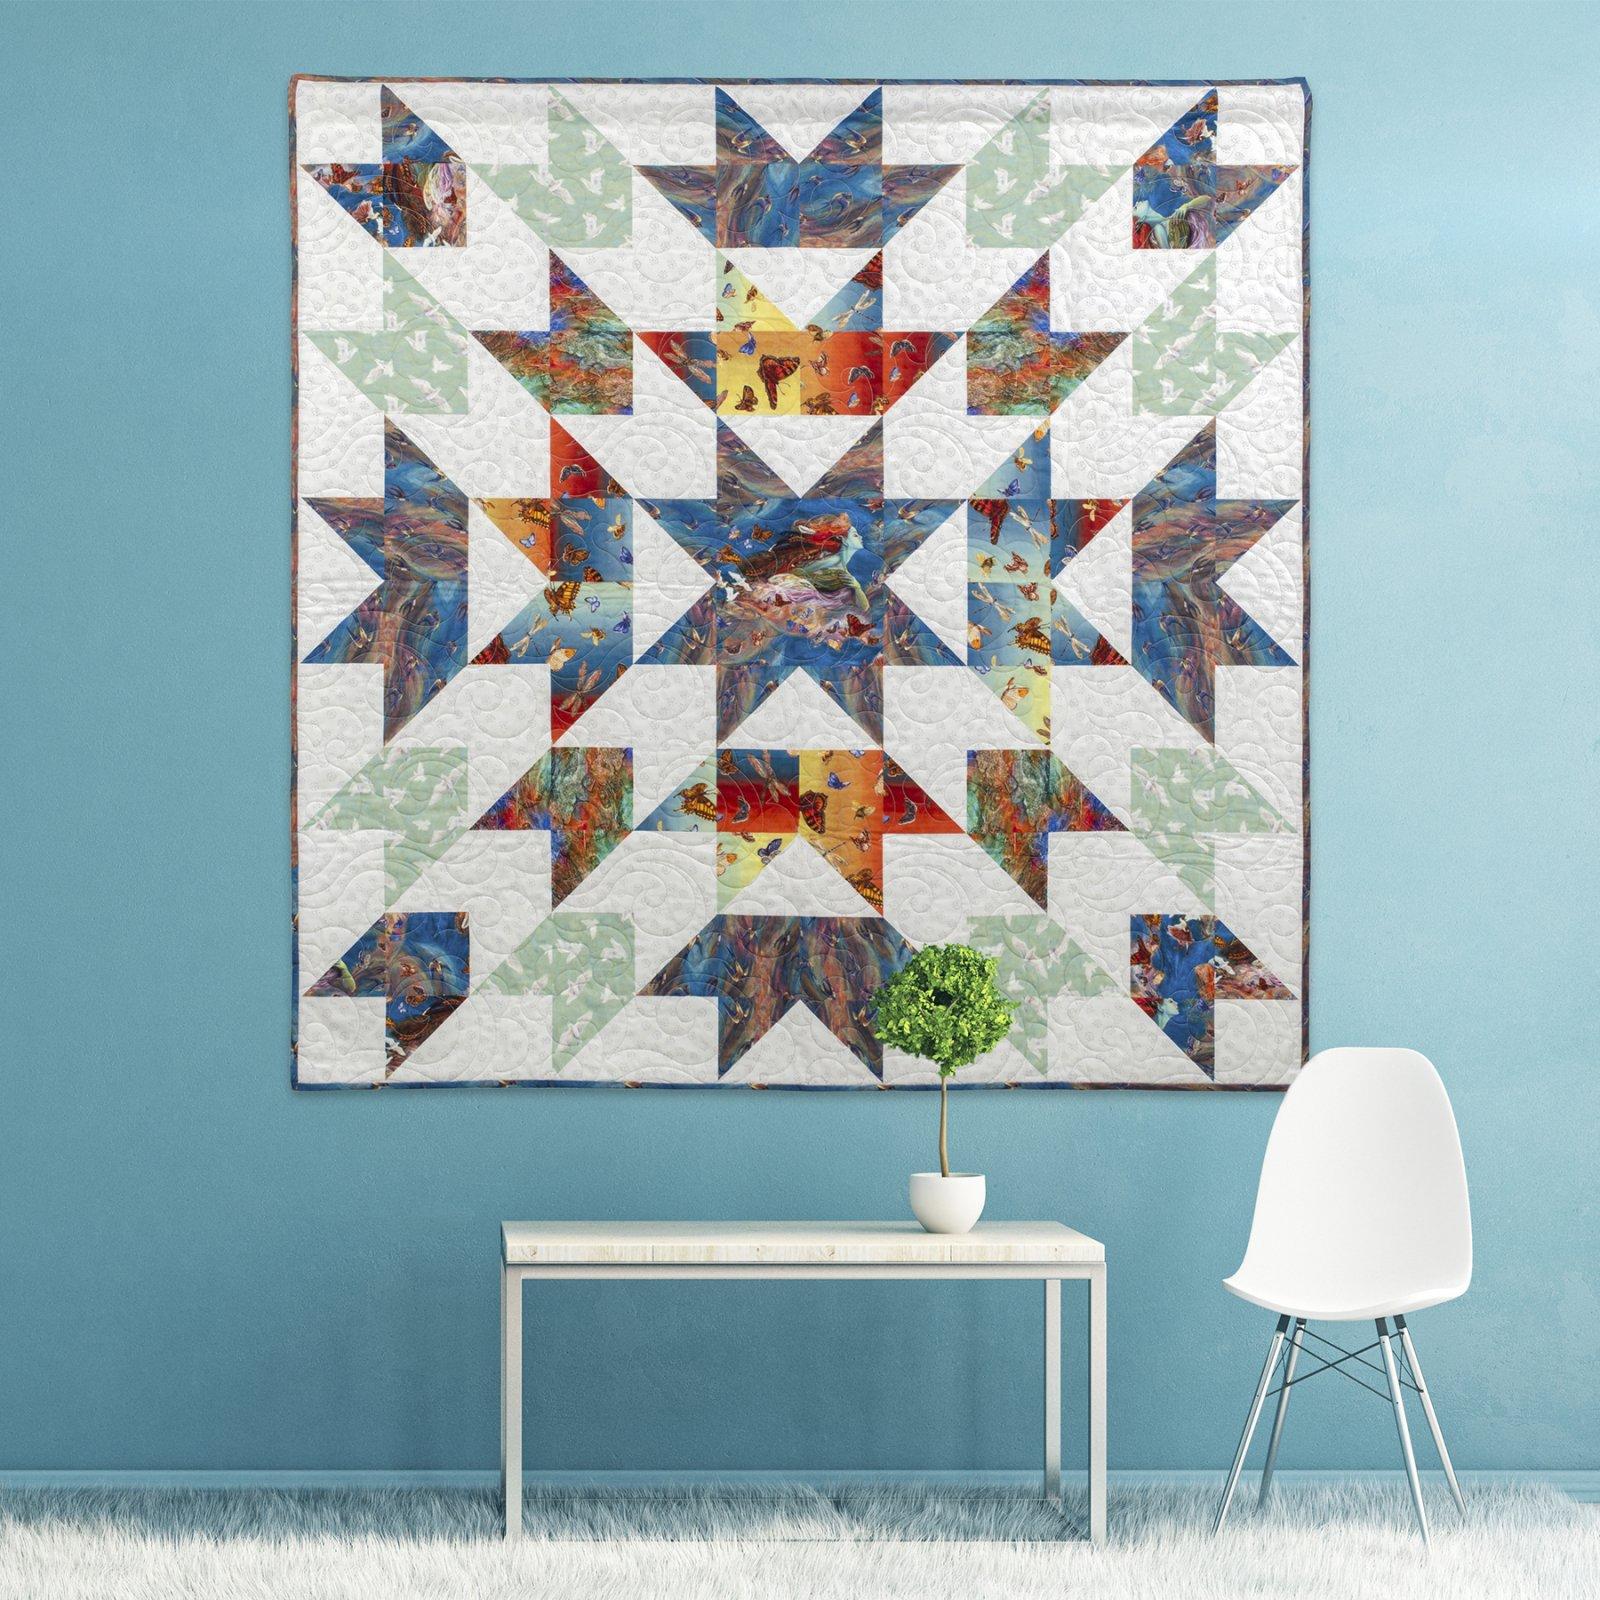 3 Wishes Fabric<br>Radiant Spirit Quilt